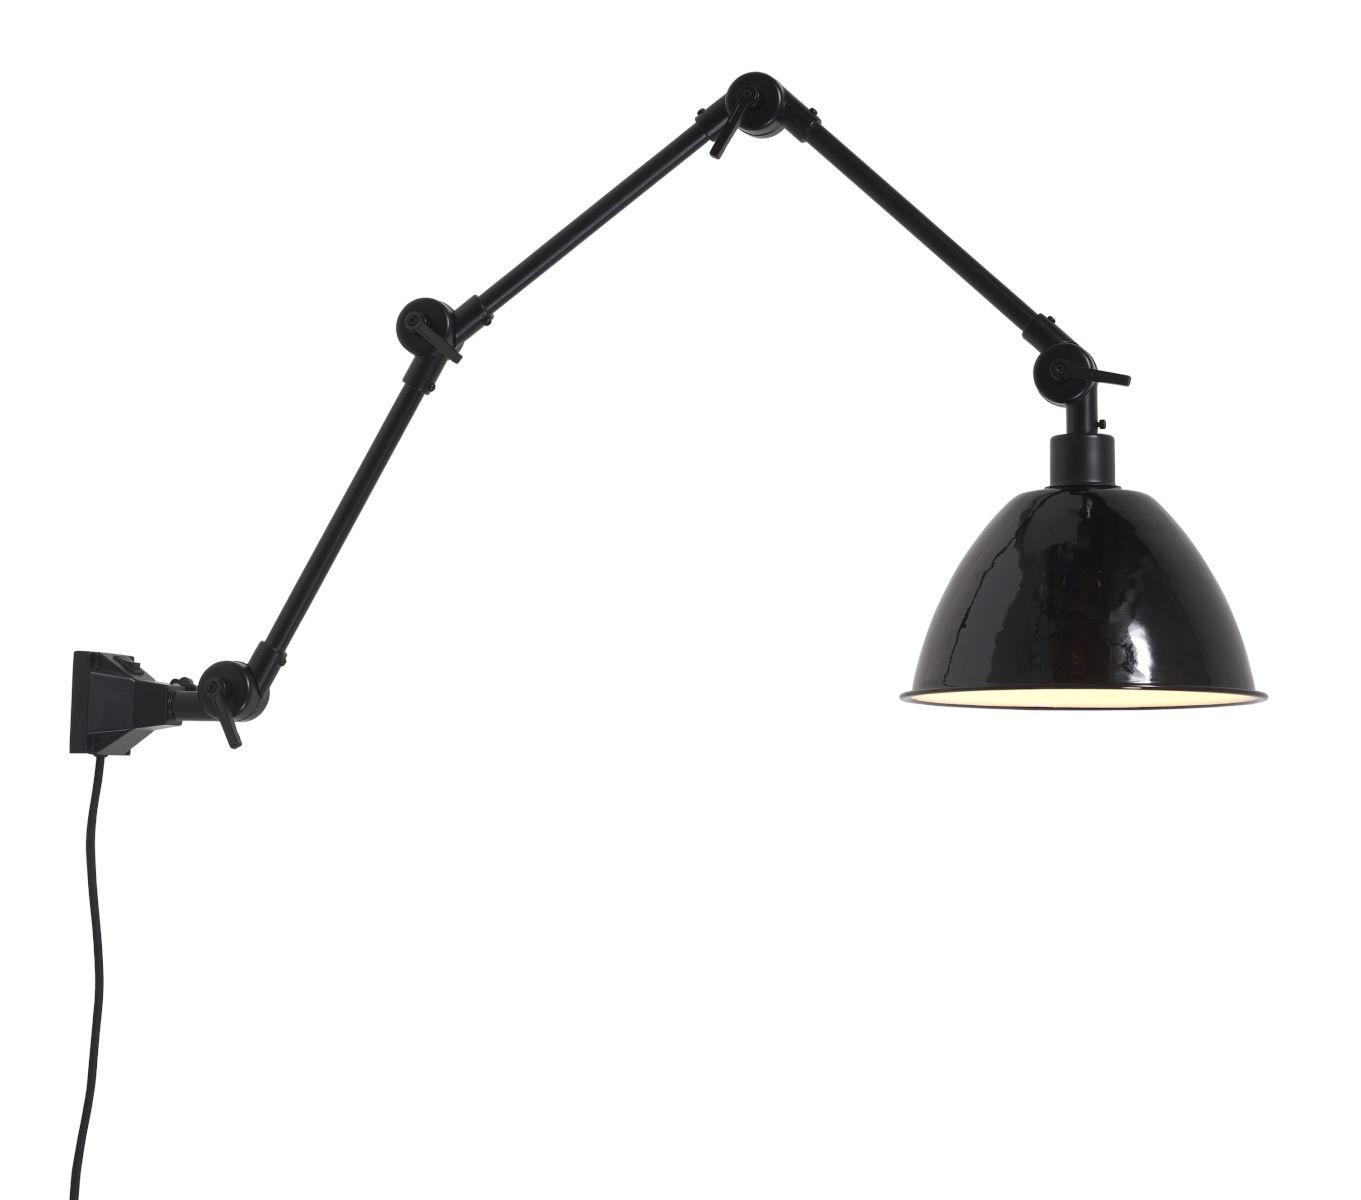 Wandlamp Amsterdam enamel shade black L-1